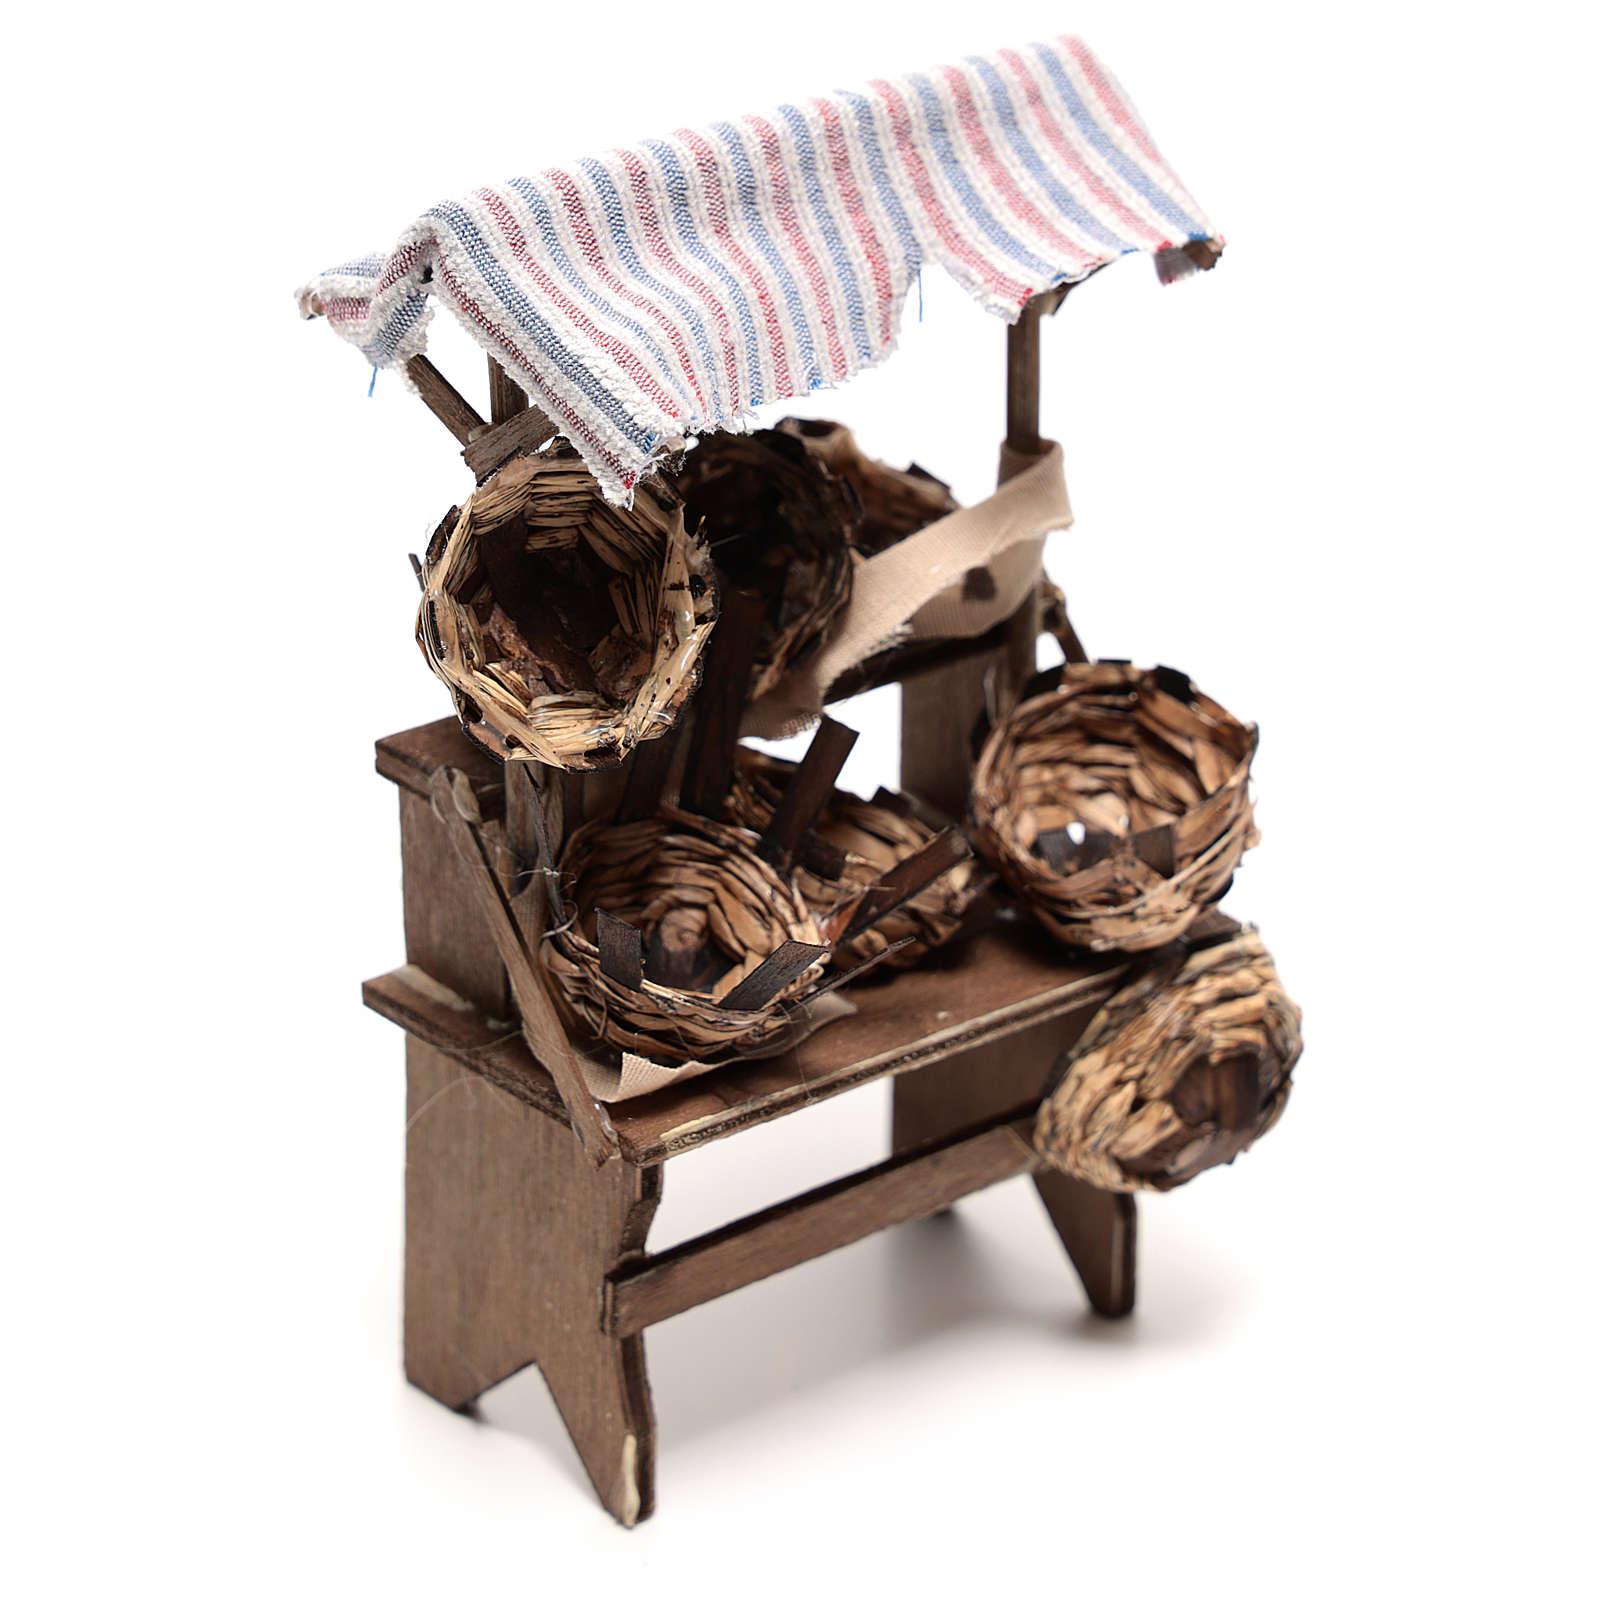 Mostrador vendedor de cestas de 15x5x5 cm belén napolitano 14 cm 4